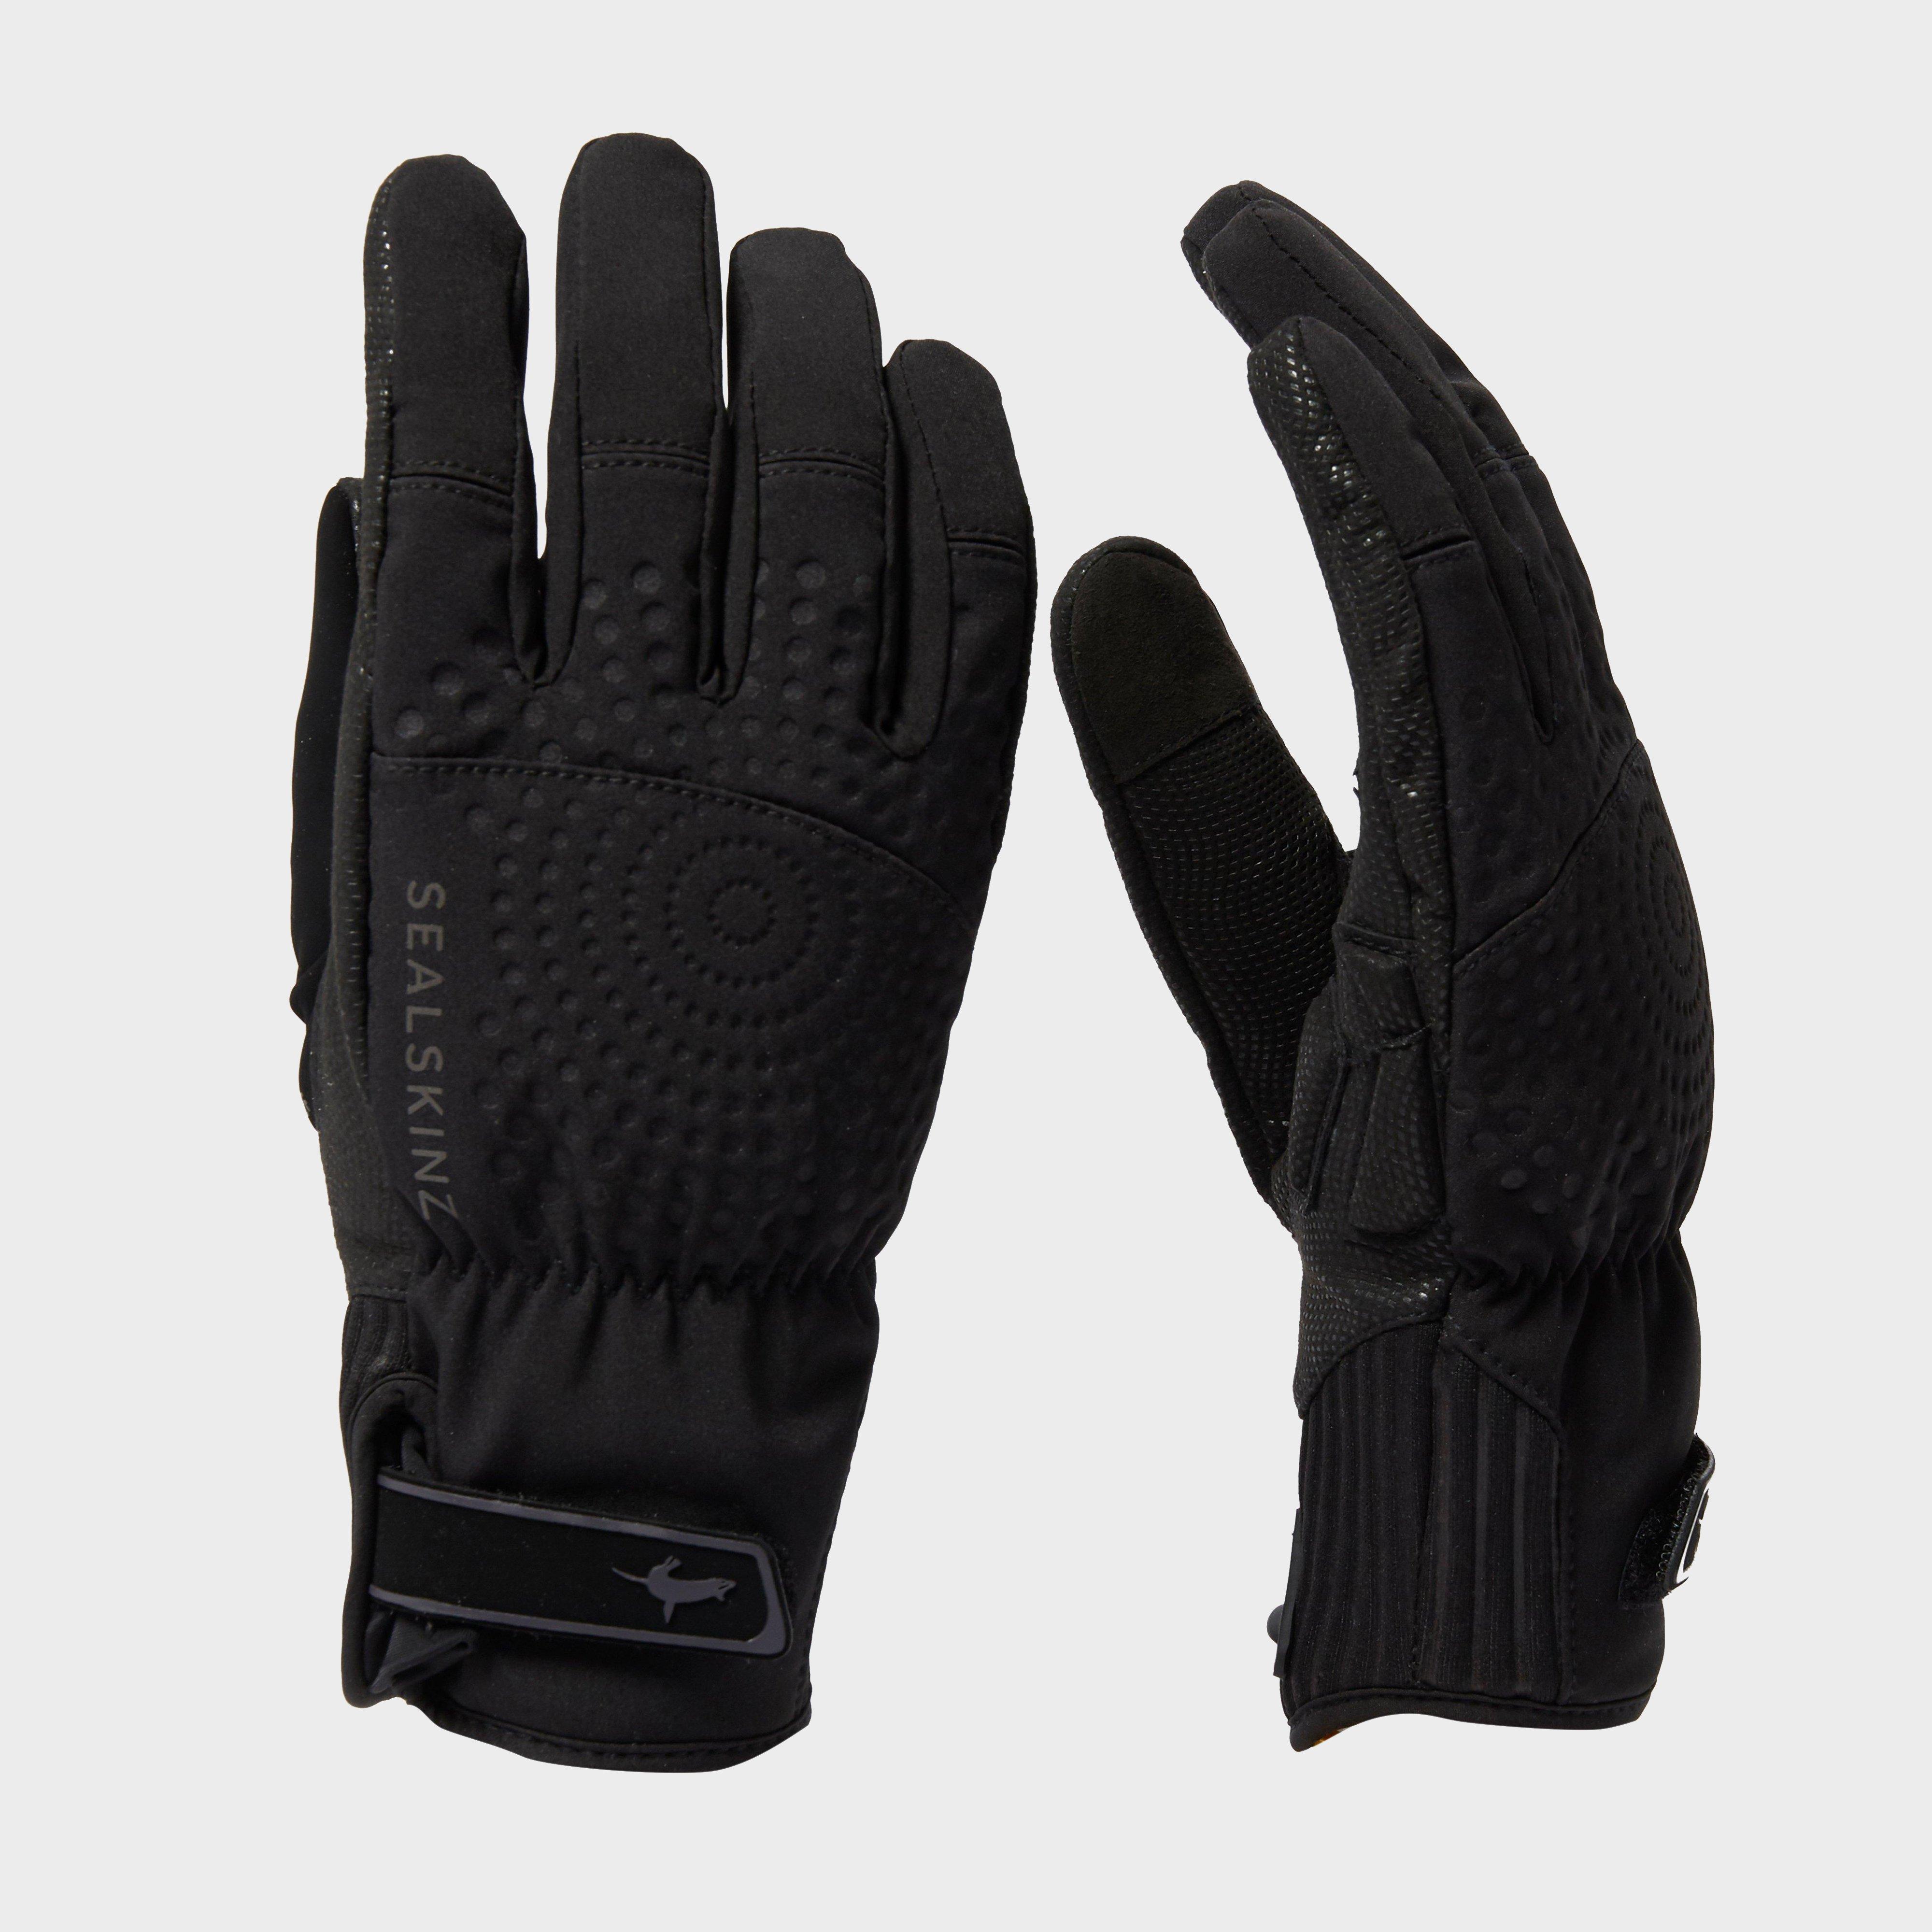 SealSkinz Sealskinz womens Brecon XP Gloves - Black, Black